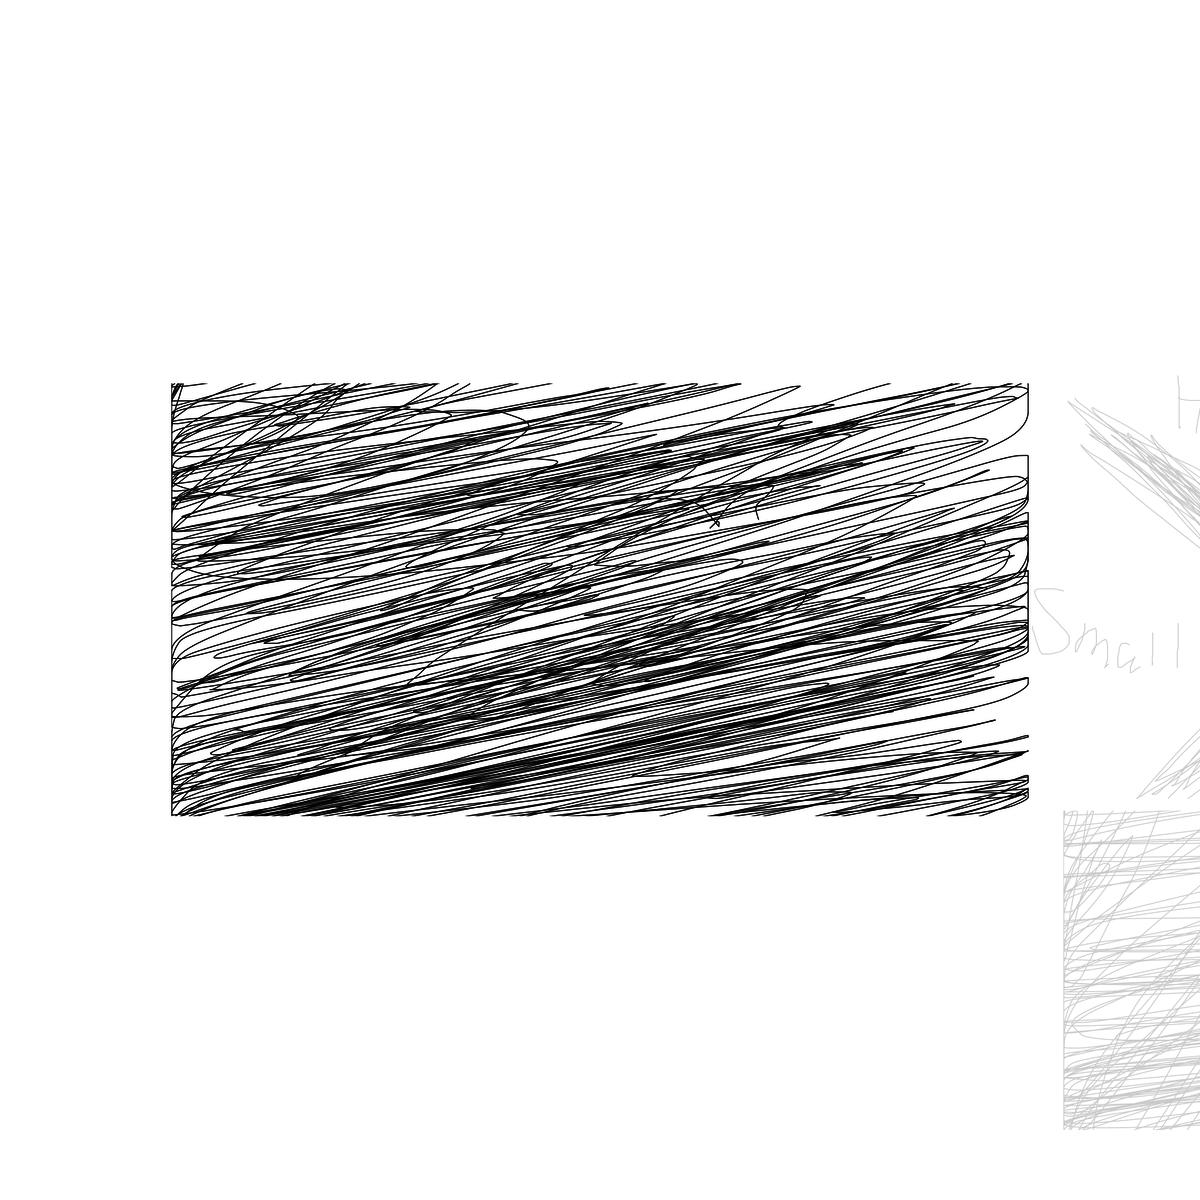 BAAAM drawing#12048 lat:43.6686210632324200lng: -79.3542404174804700